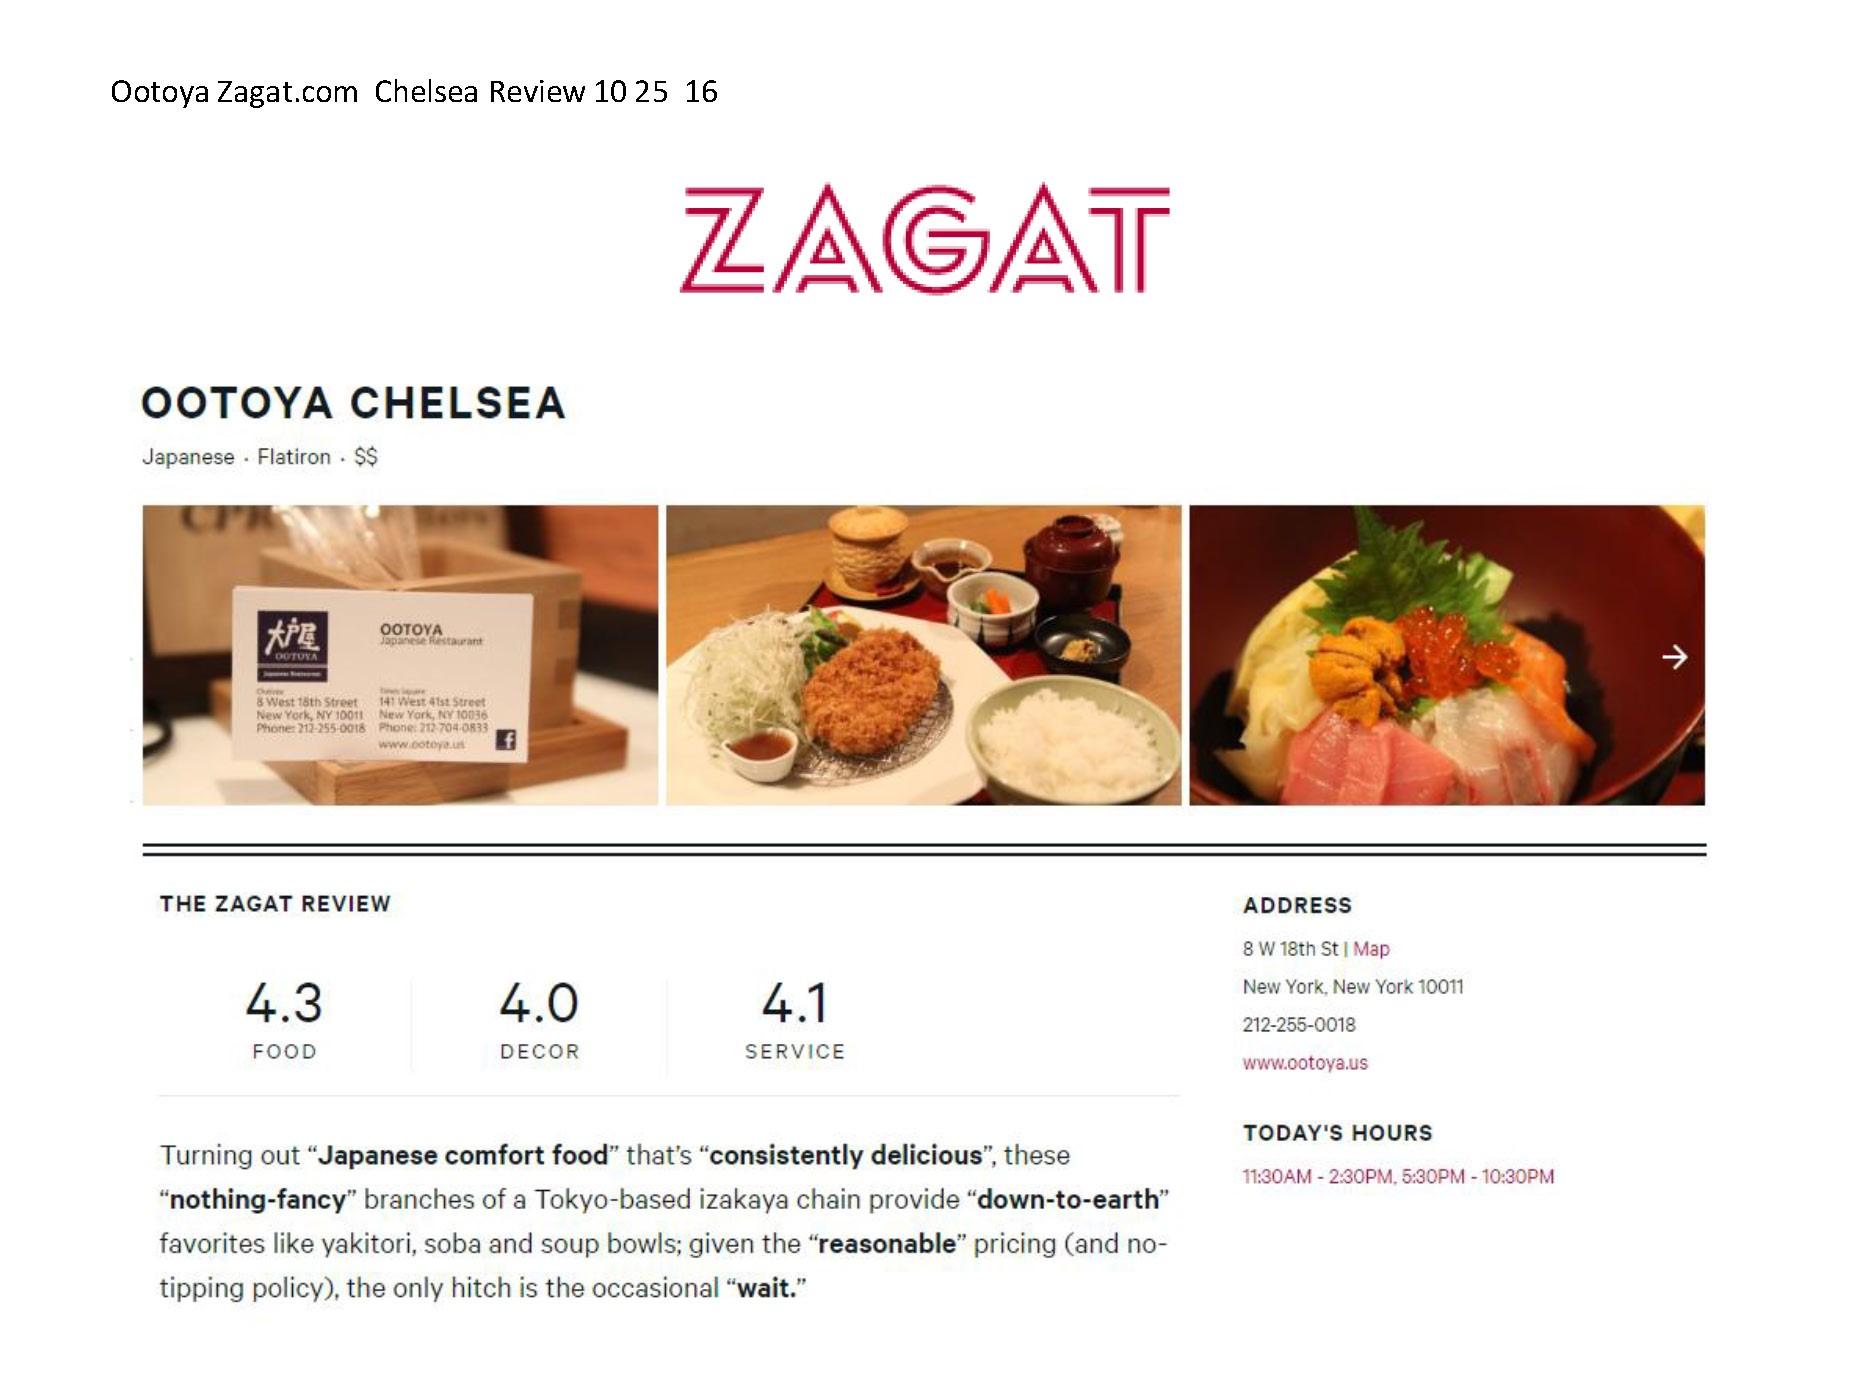 On 2017 Zagat! | Ootoya America Zagat Map on